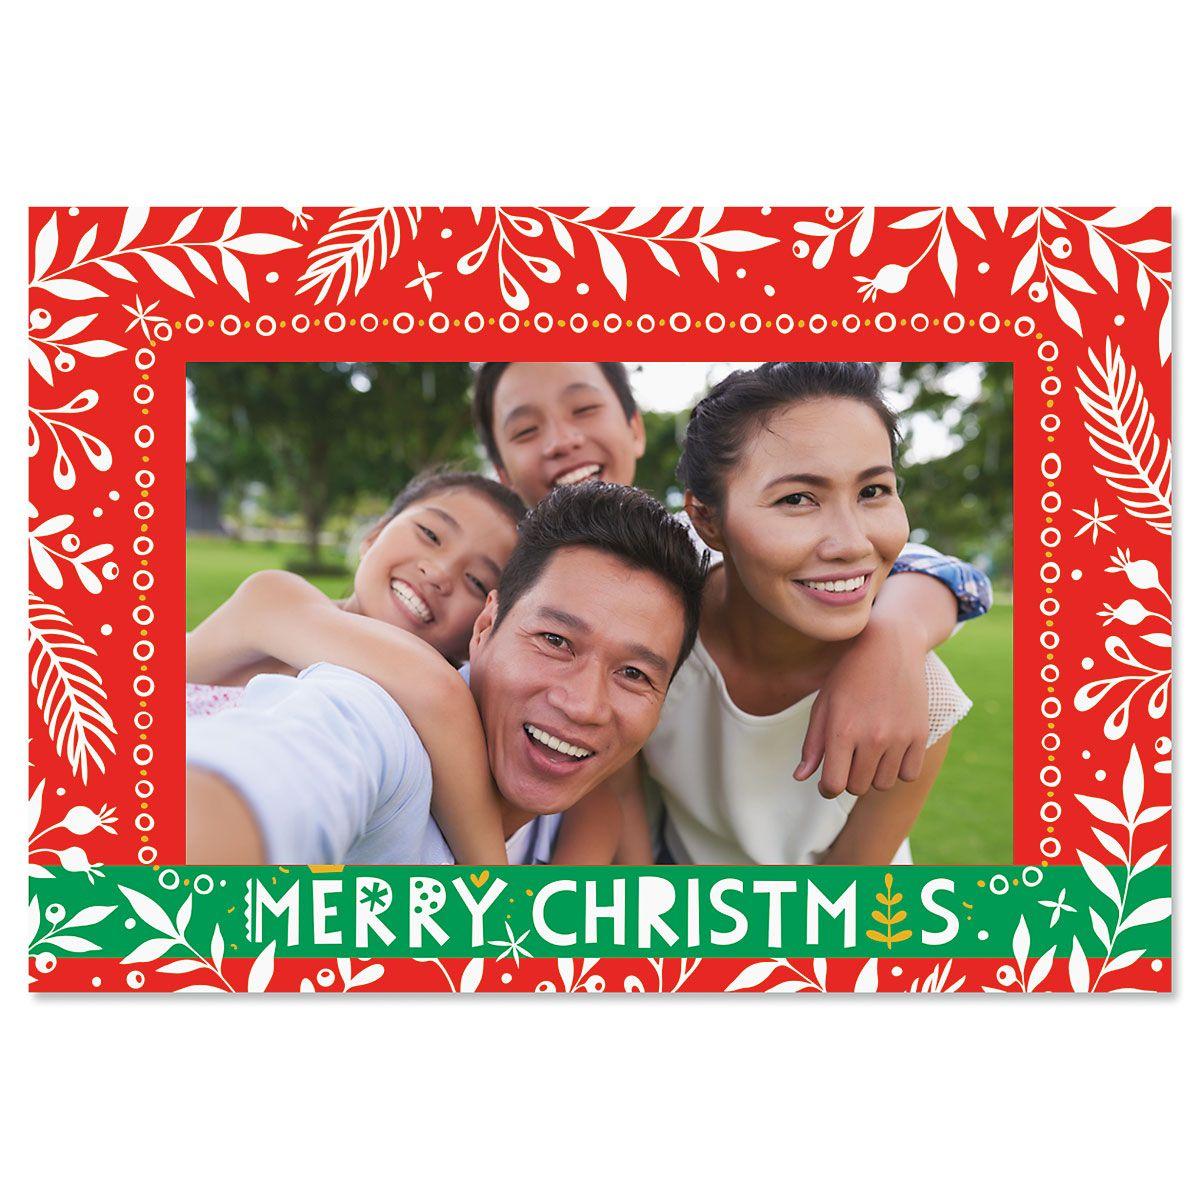 Merry Christmas Photo Sleeve Christmas Cards